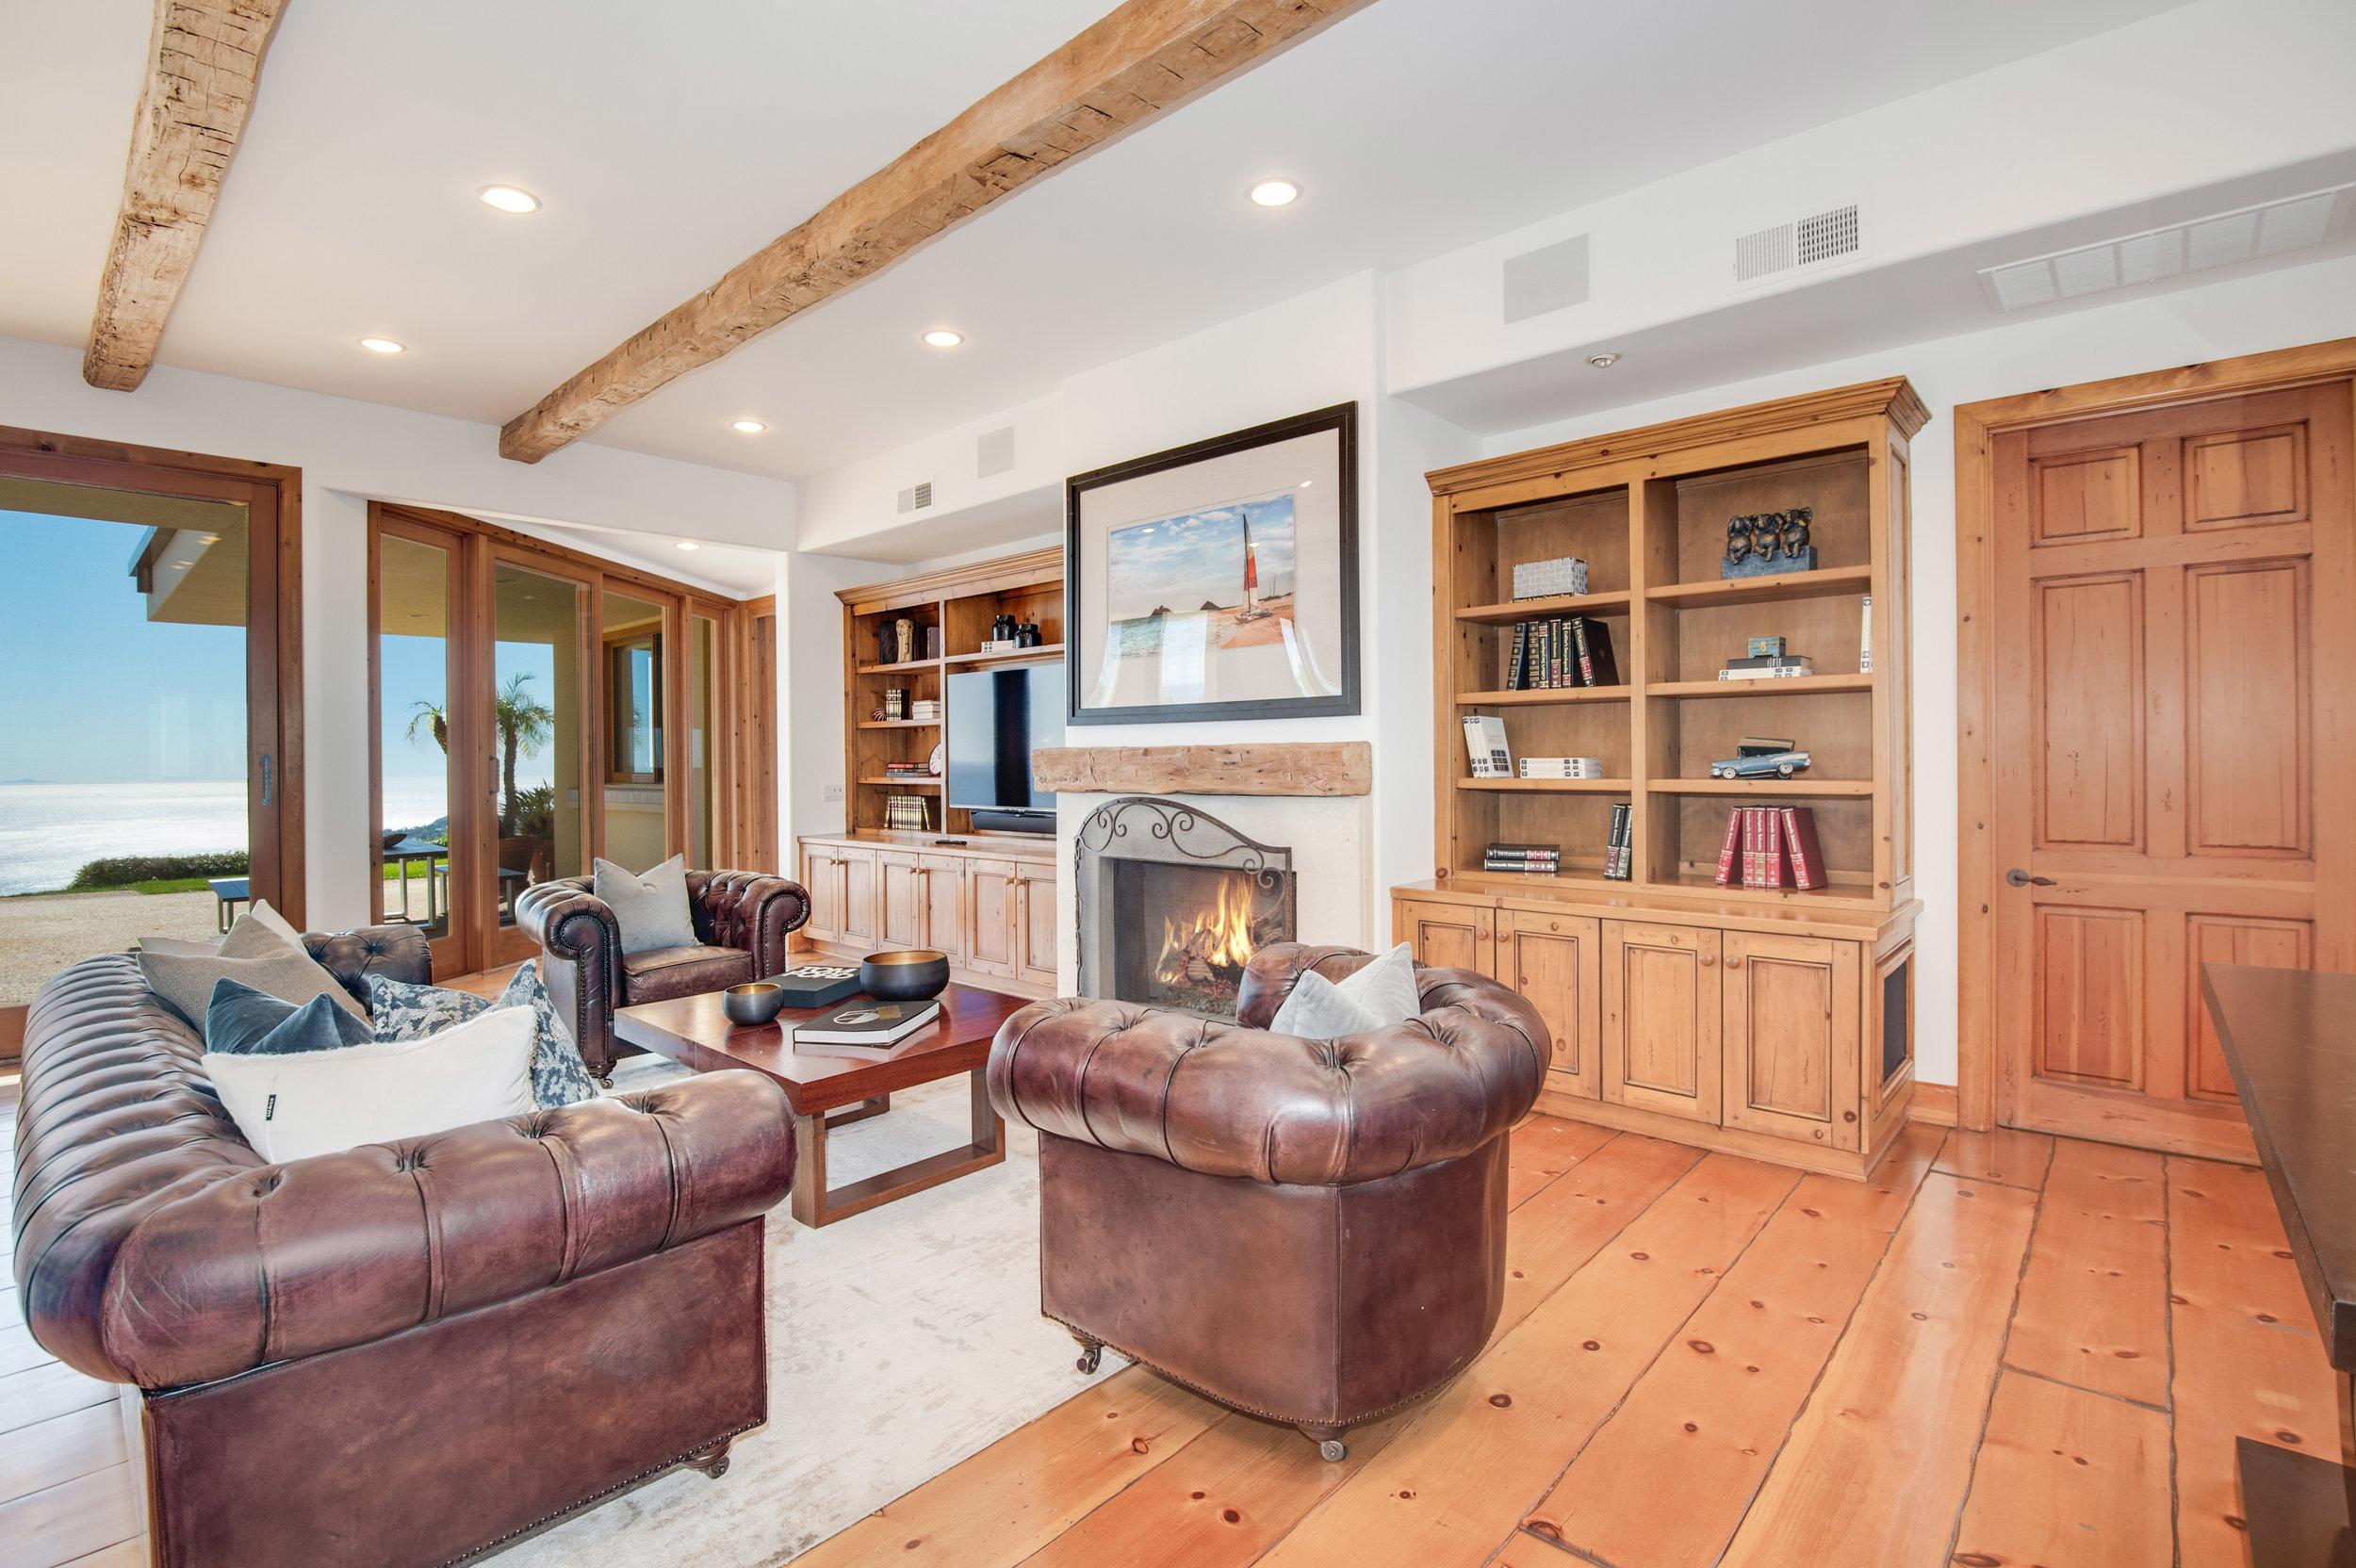 008 Kitchen 27475 Latigo Bay View Drive For Sale Lease The Malibu Life Team Luxury Real Estate.jpg